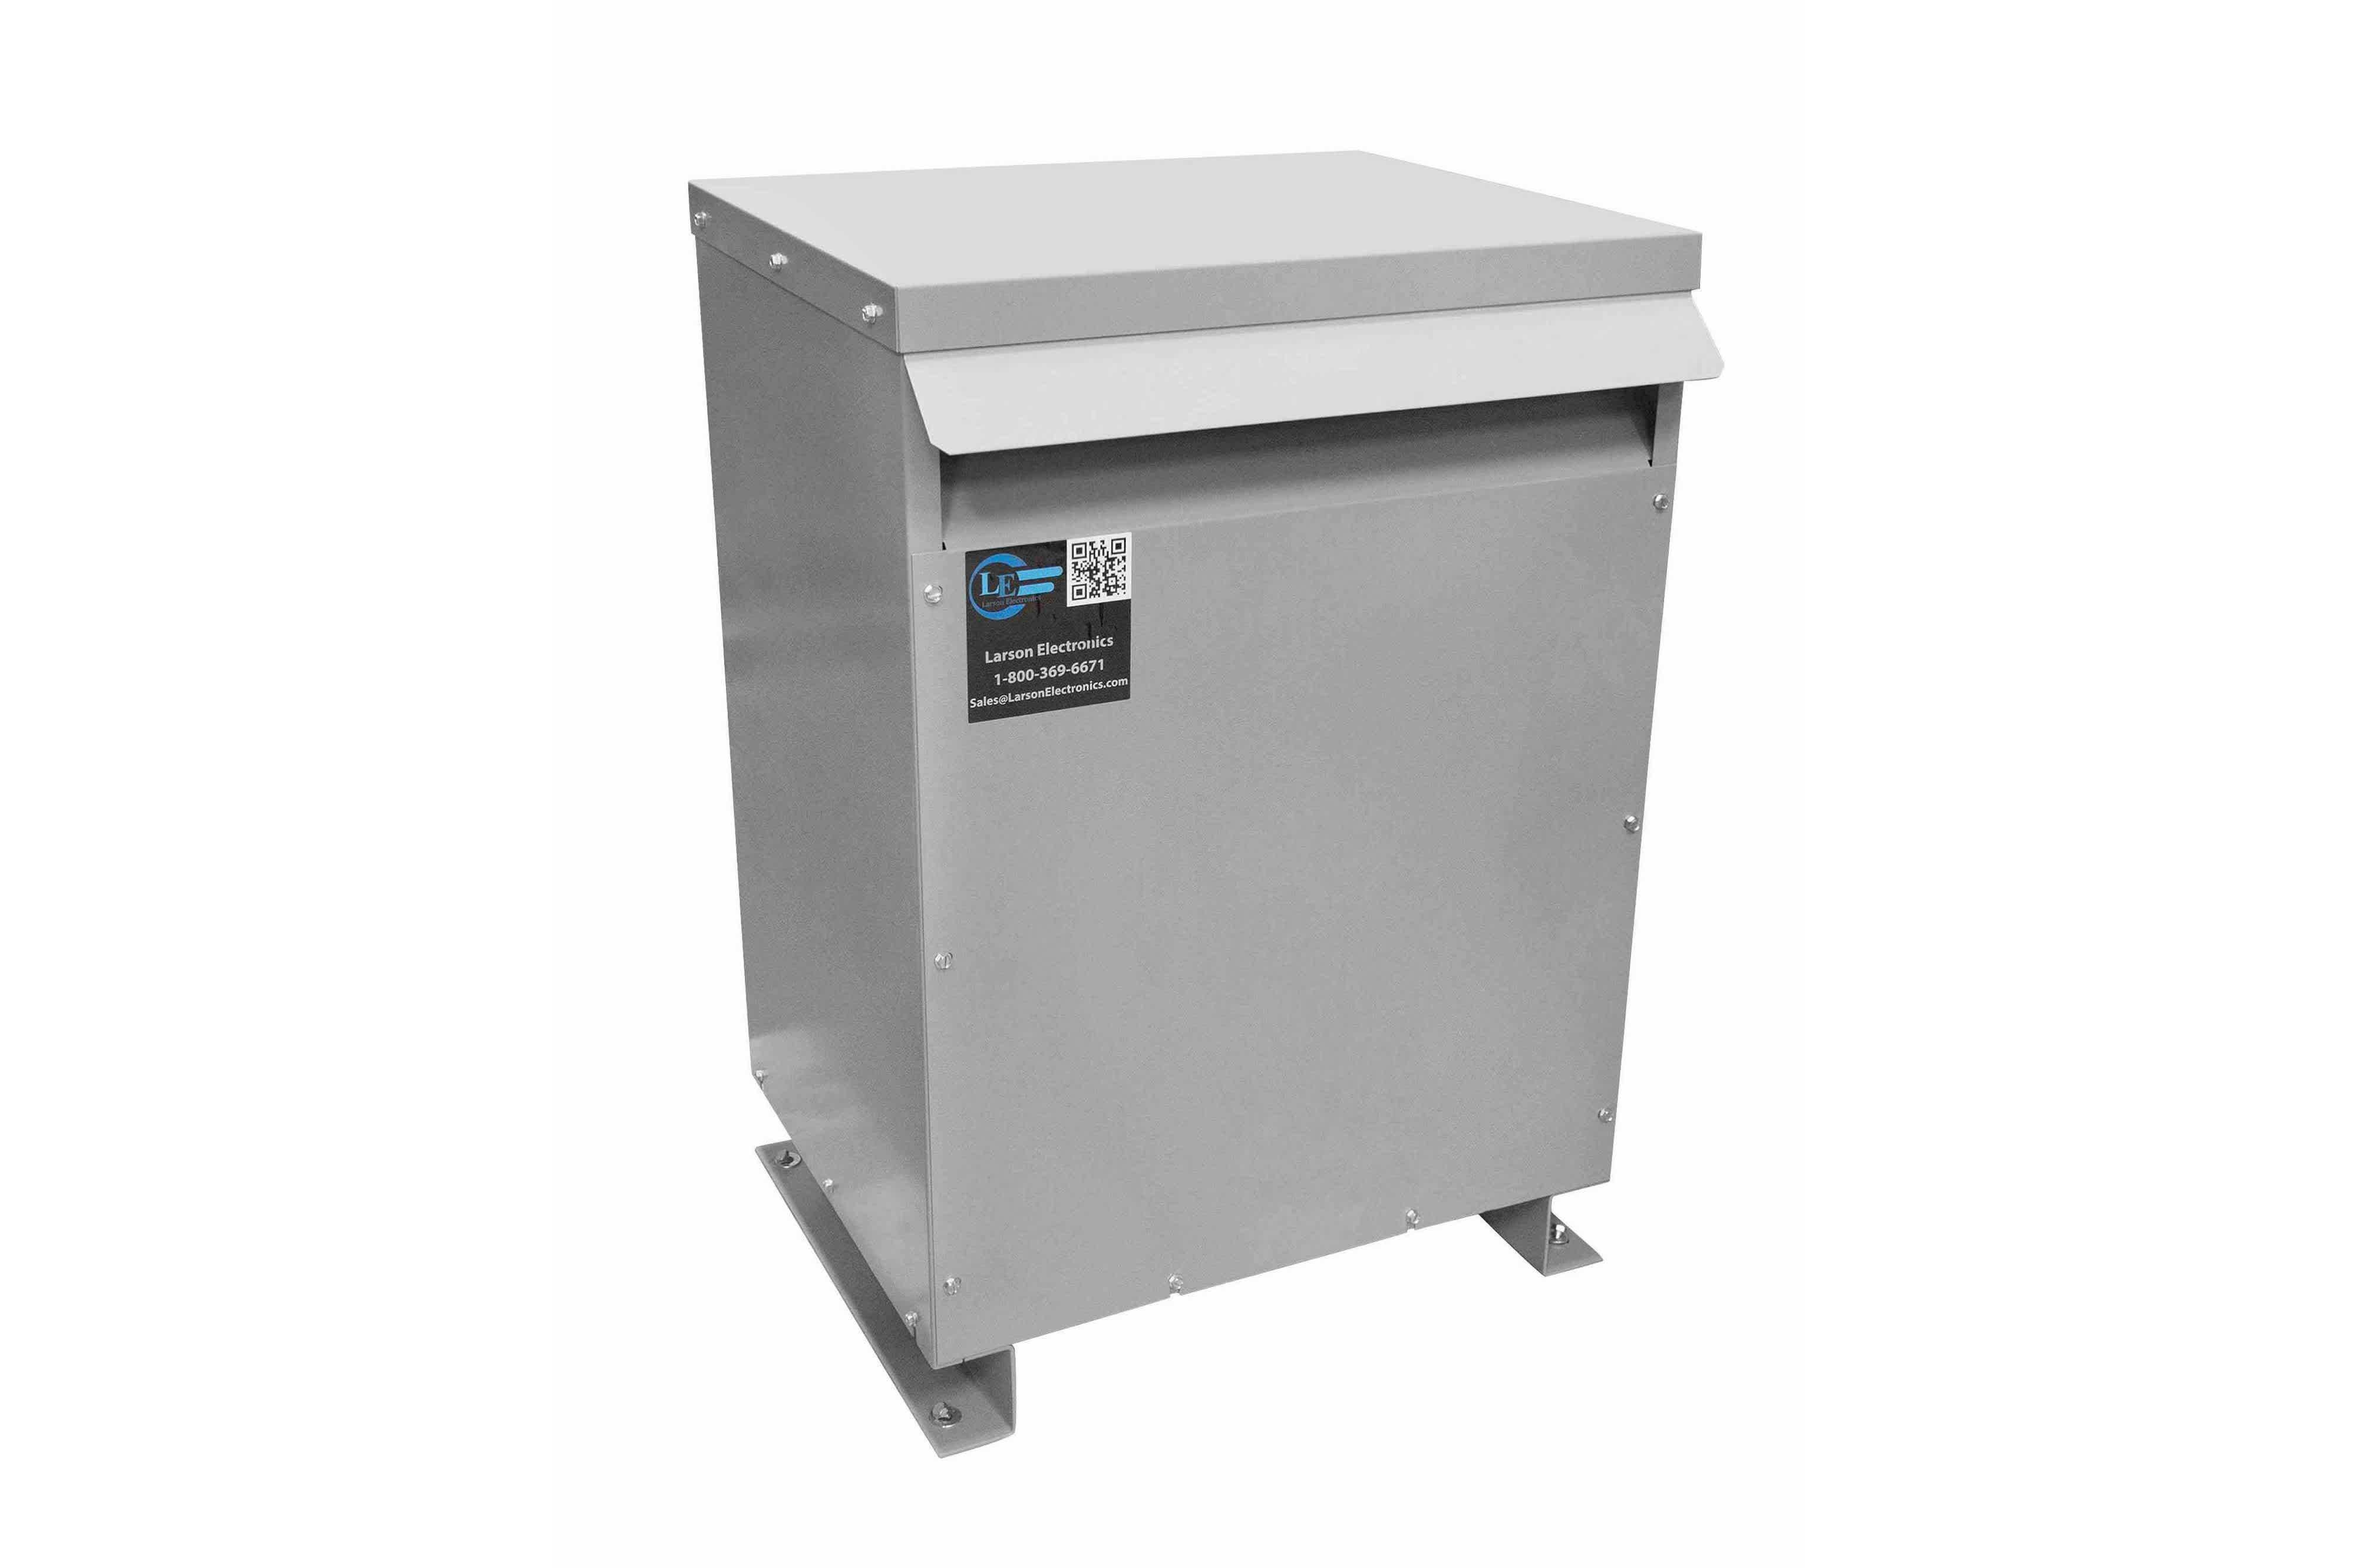 26 kVA 3PH Isolation Transformer, 415V Wye Primary, 240V/120 Delta Secondary, N3R, Ventilated, 60 Hz